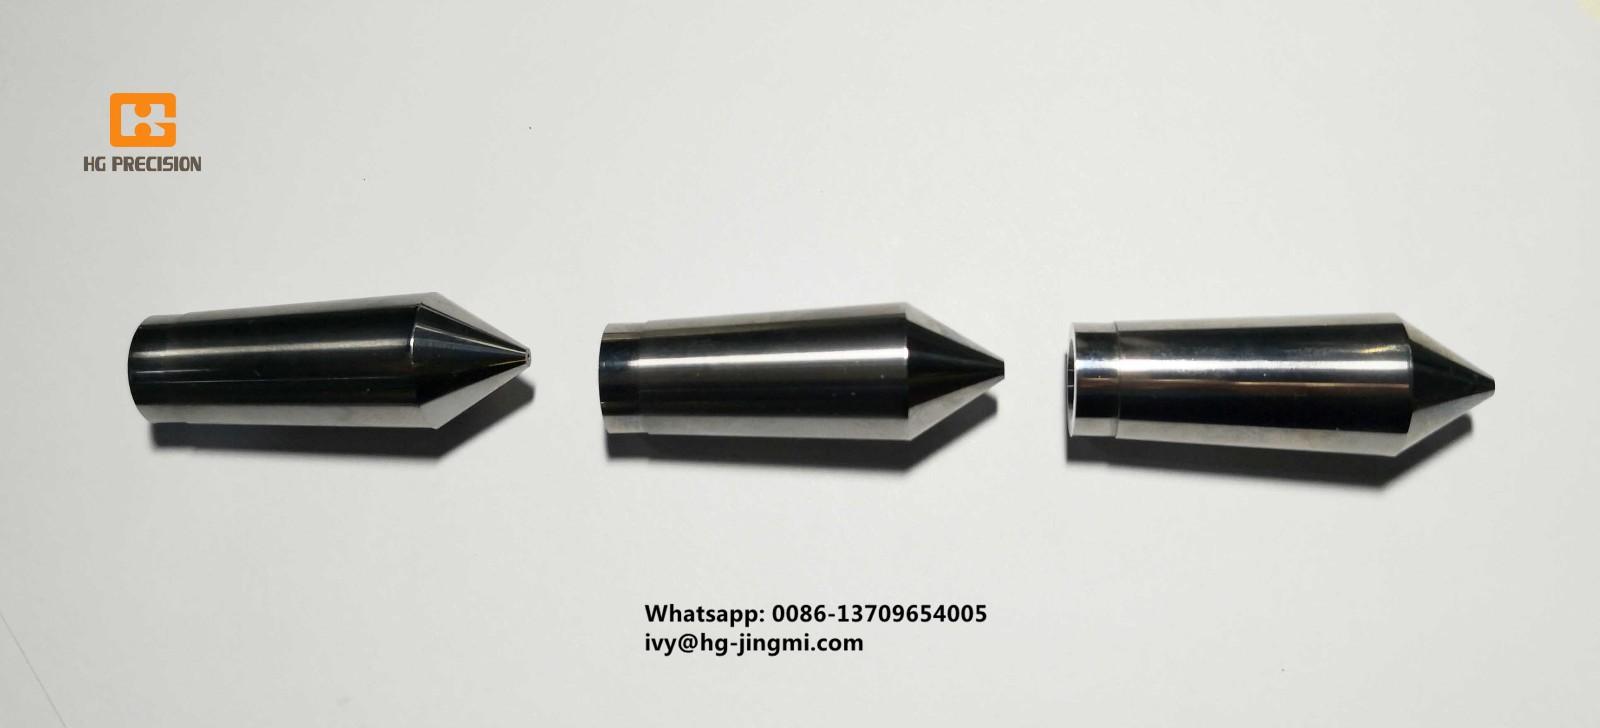 Carbide Nipple Die-HG Precision